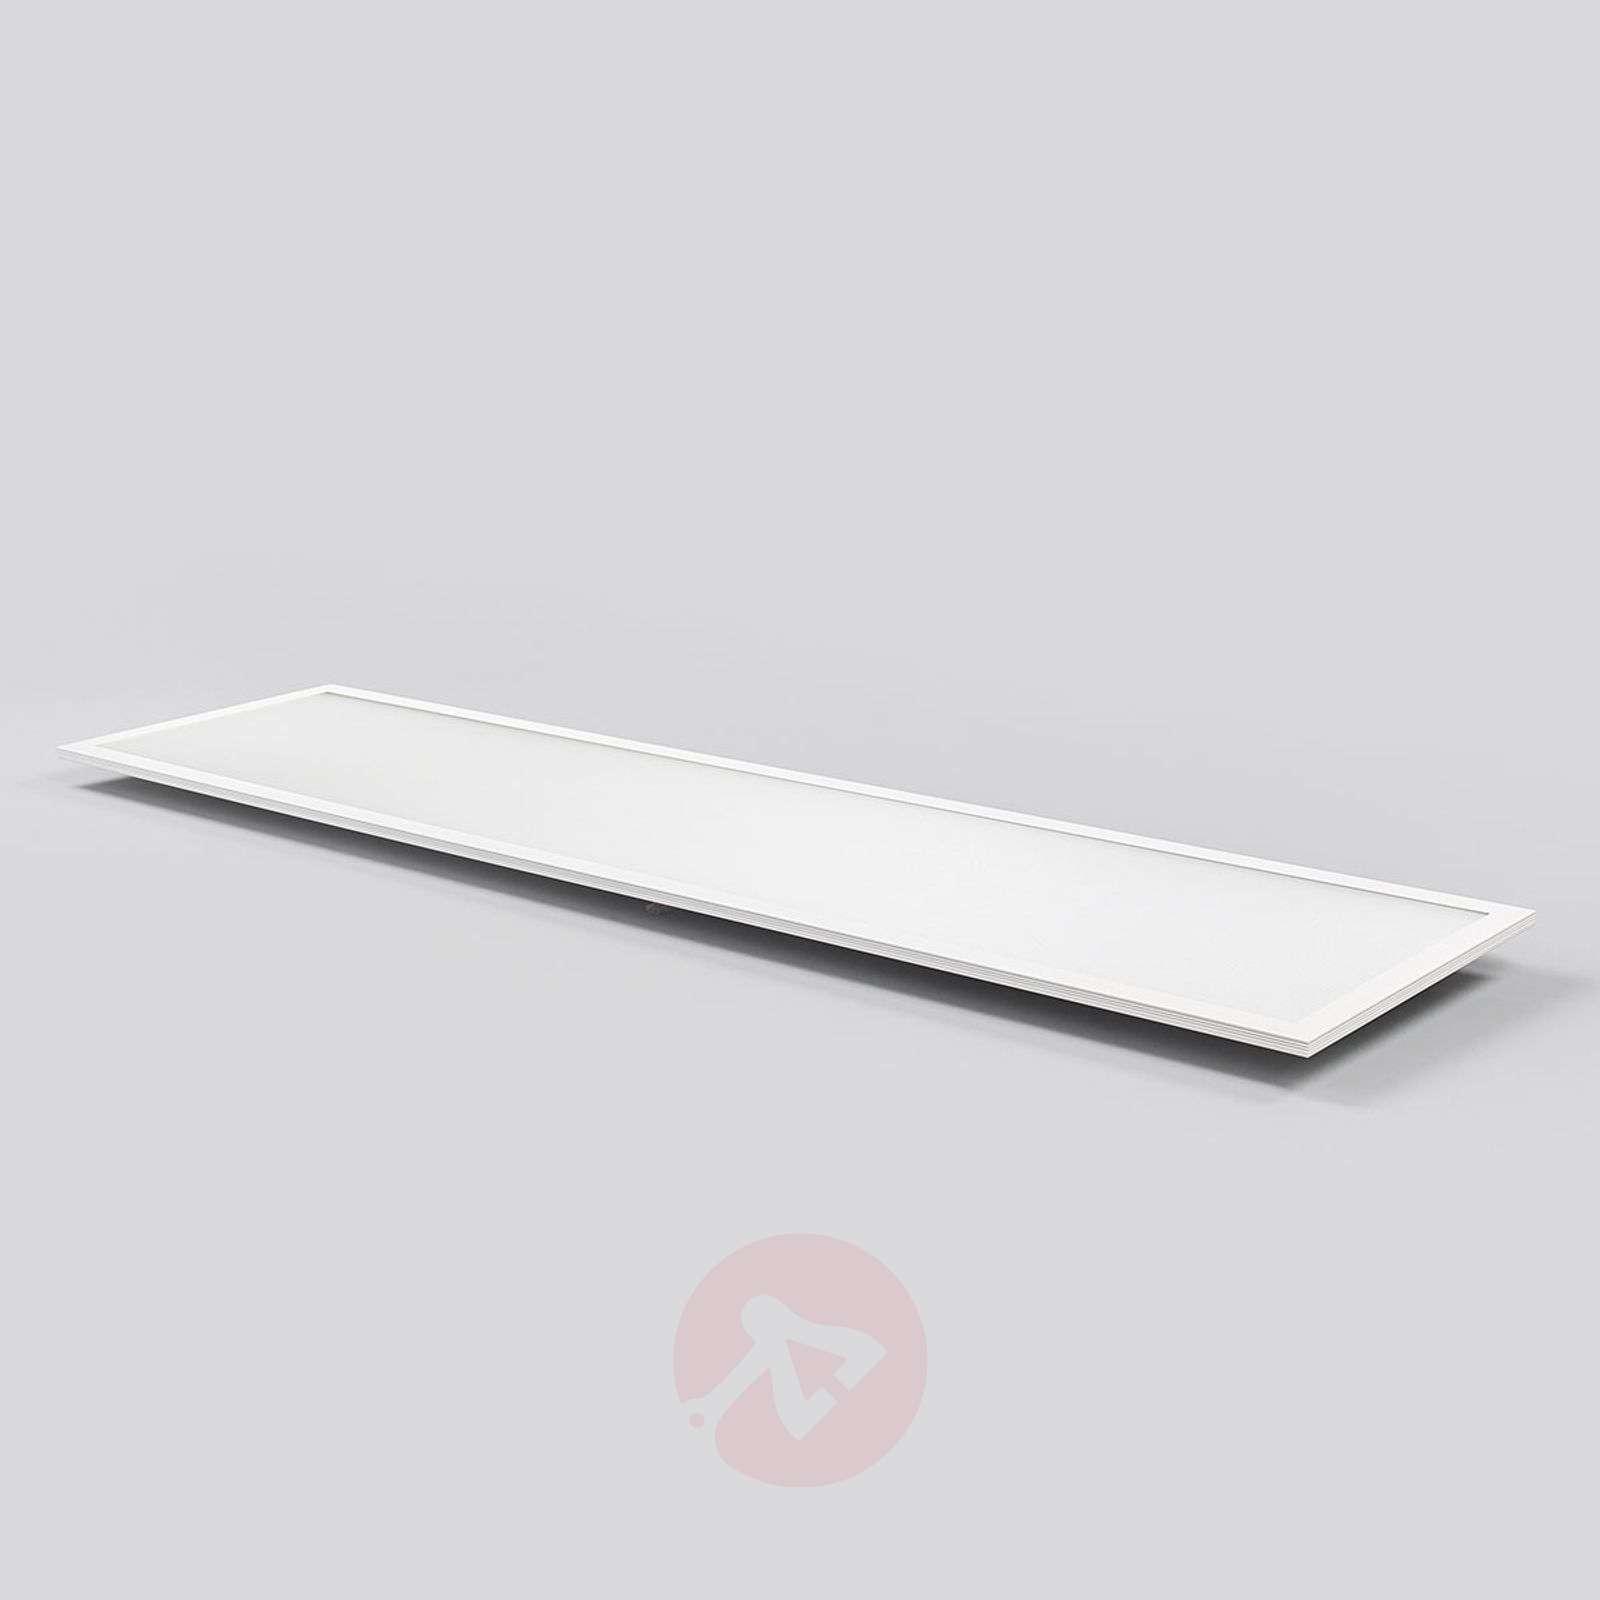 Rectangular LED ceiling light Inga, cool white-9978081-018